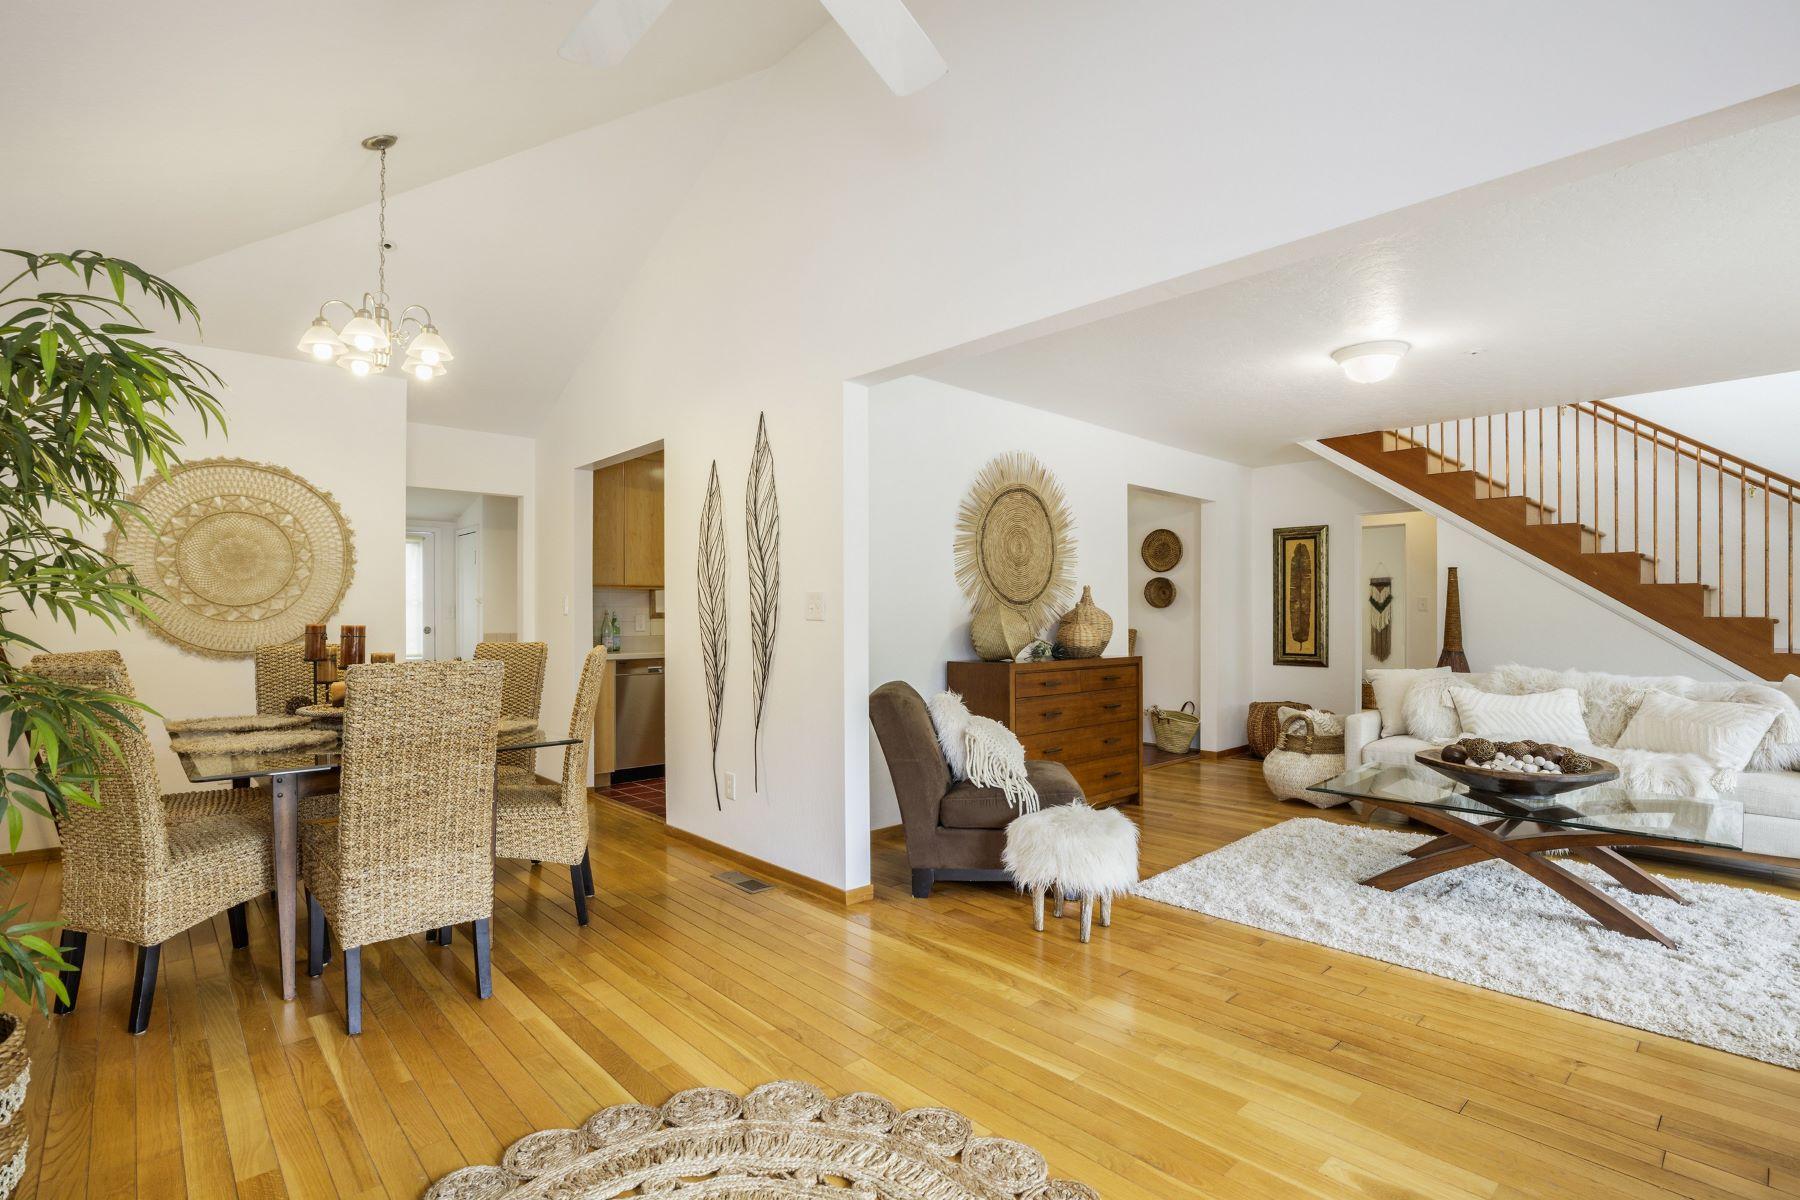 獨棟家庭住宅 為 出售 在 Cozy Mill Valley Home with a Separate In-Law! 53 Bayview Terrace Mill Valley, 加利福尼亞州, 94941 美國